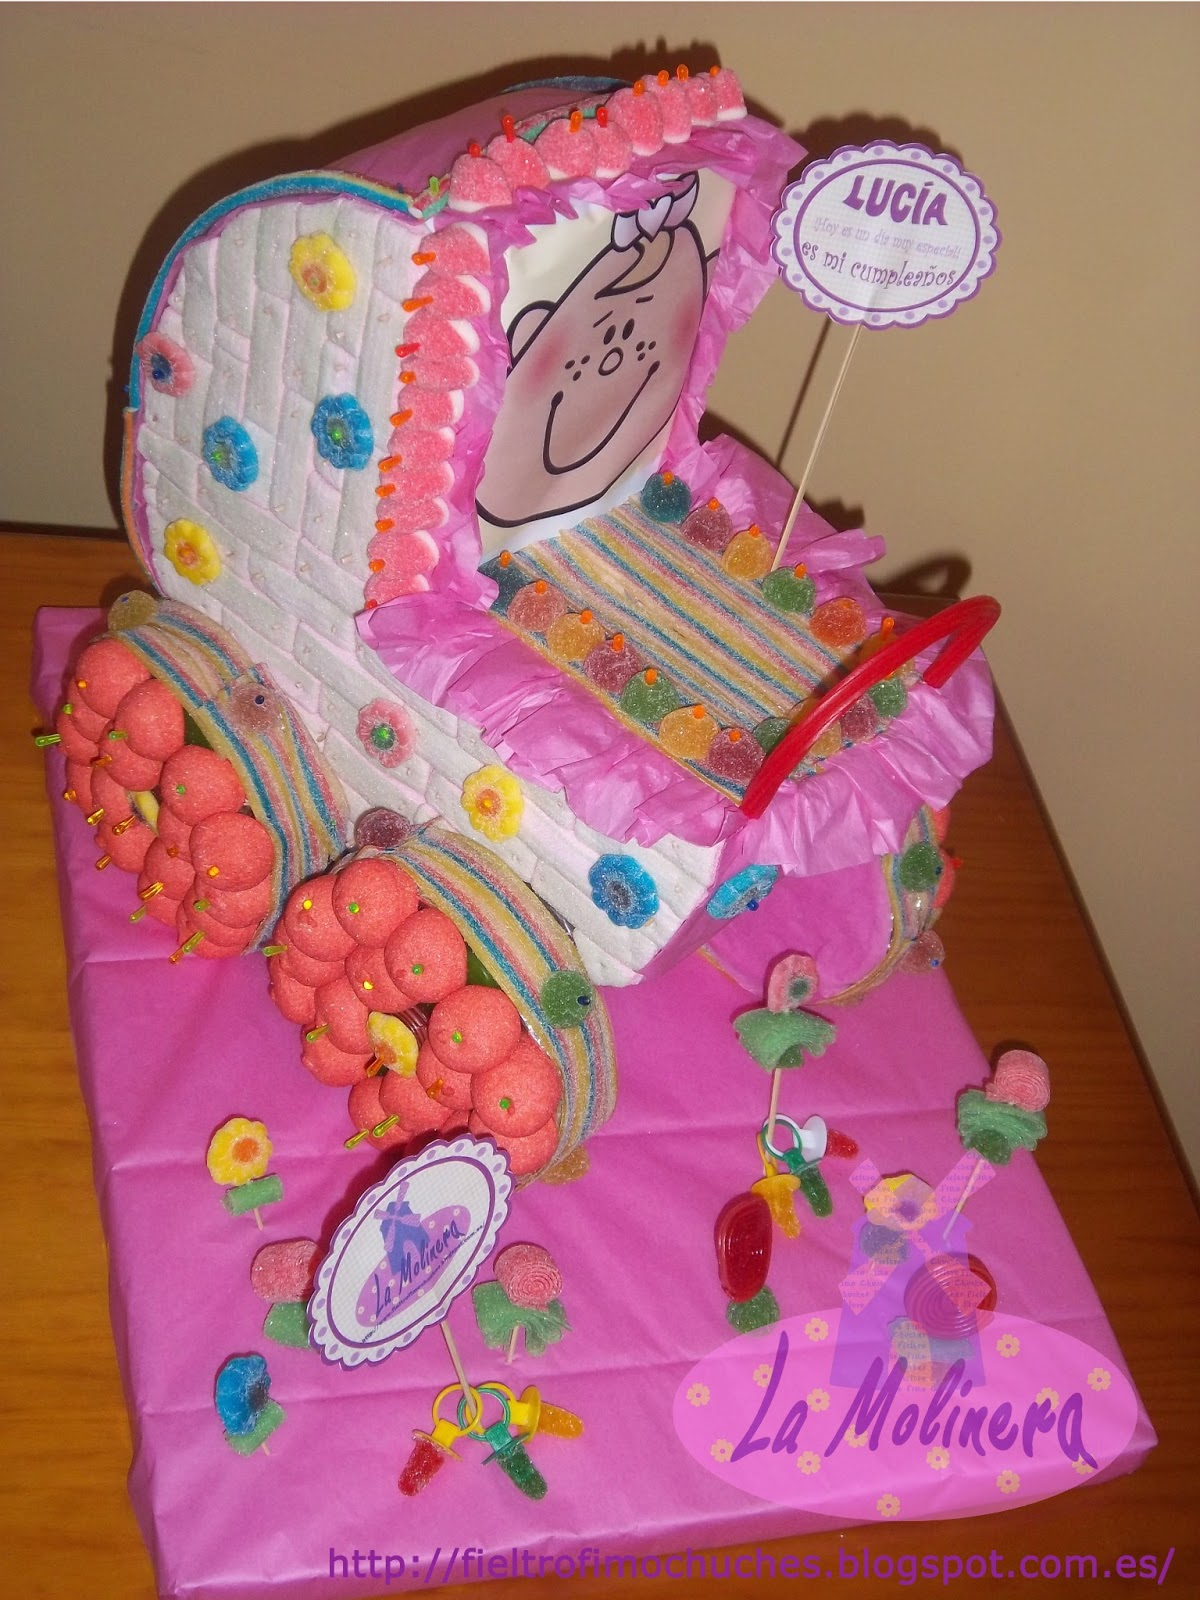 La molinera tarta chuches carrito beb - Carro de chuches para cumpleanos ...